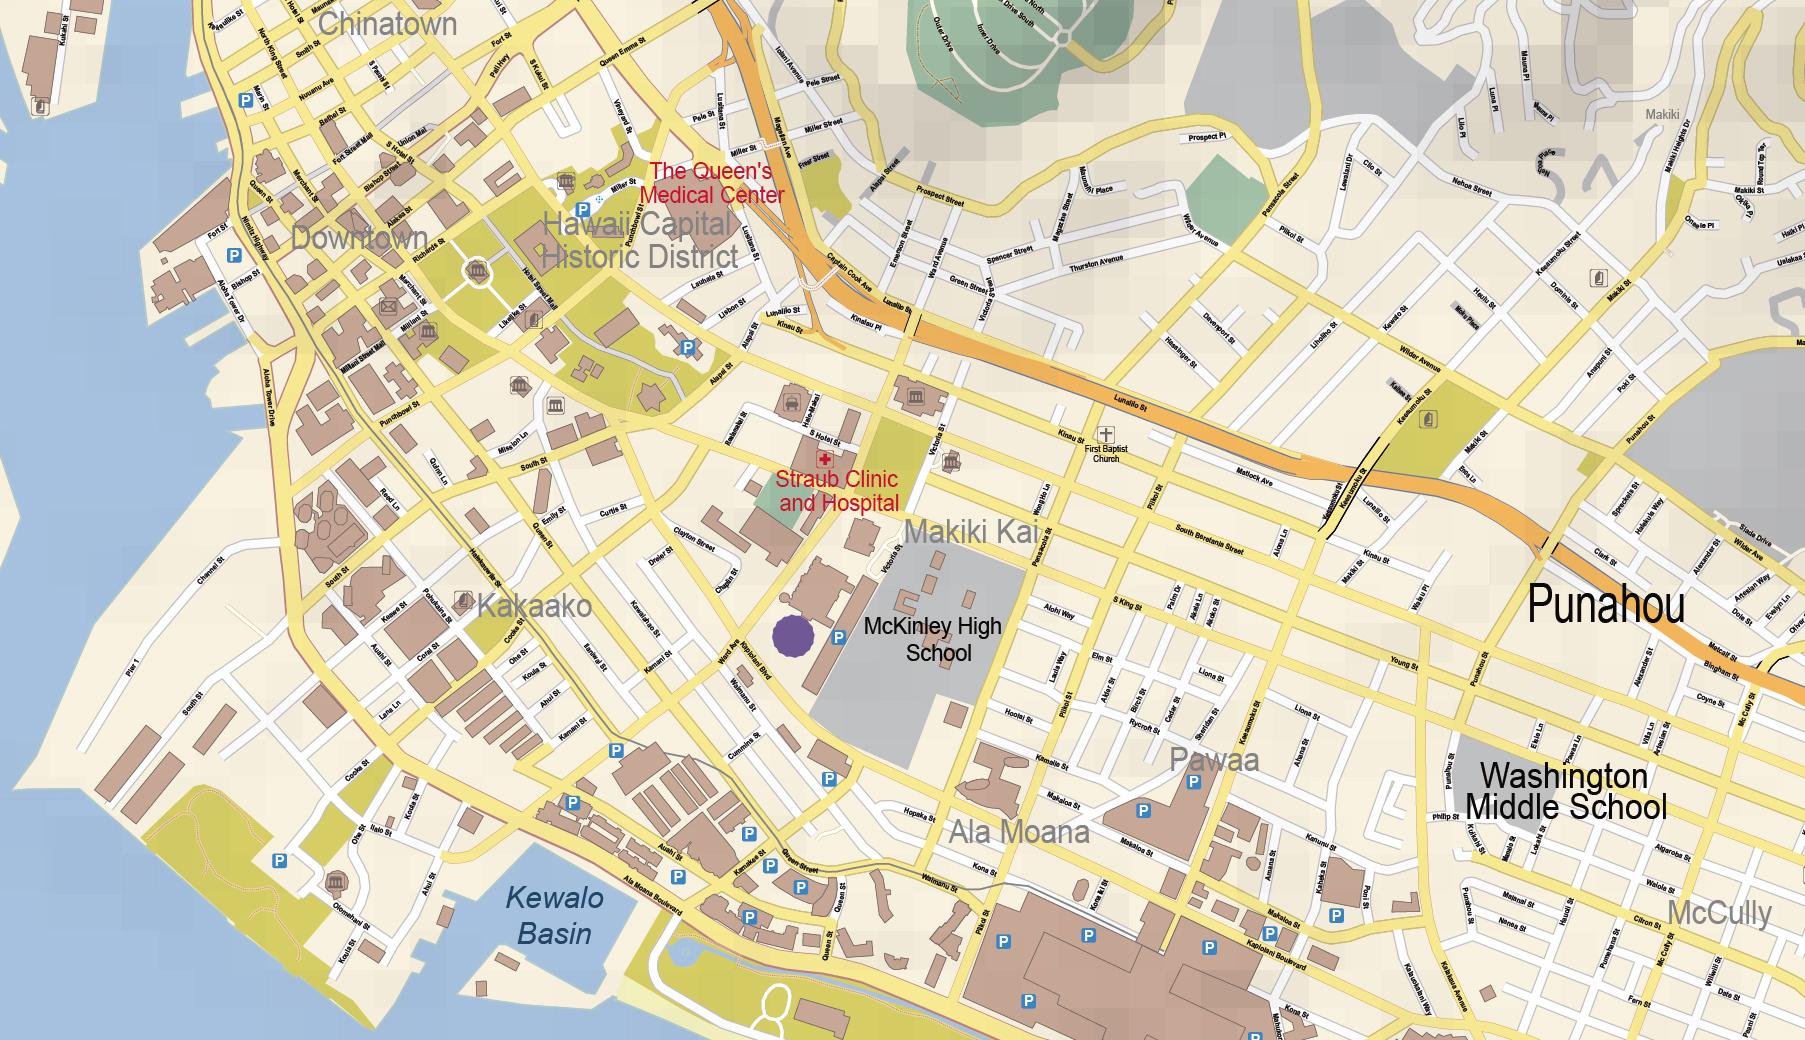 Honolulu Oahu Mapillustratorcom Map oahu mappery